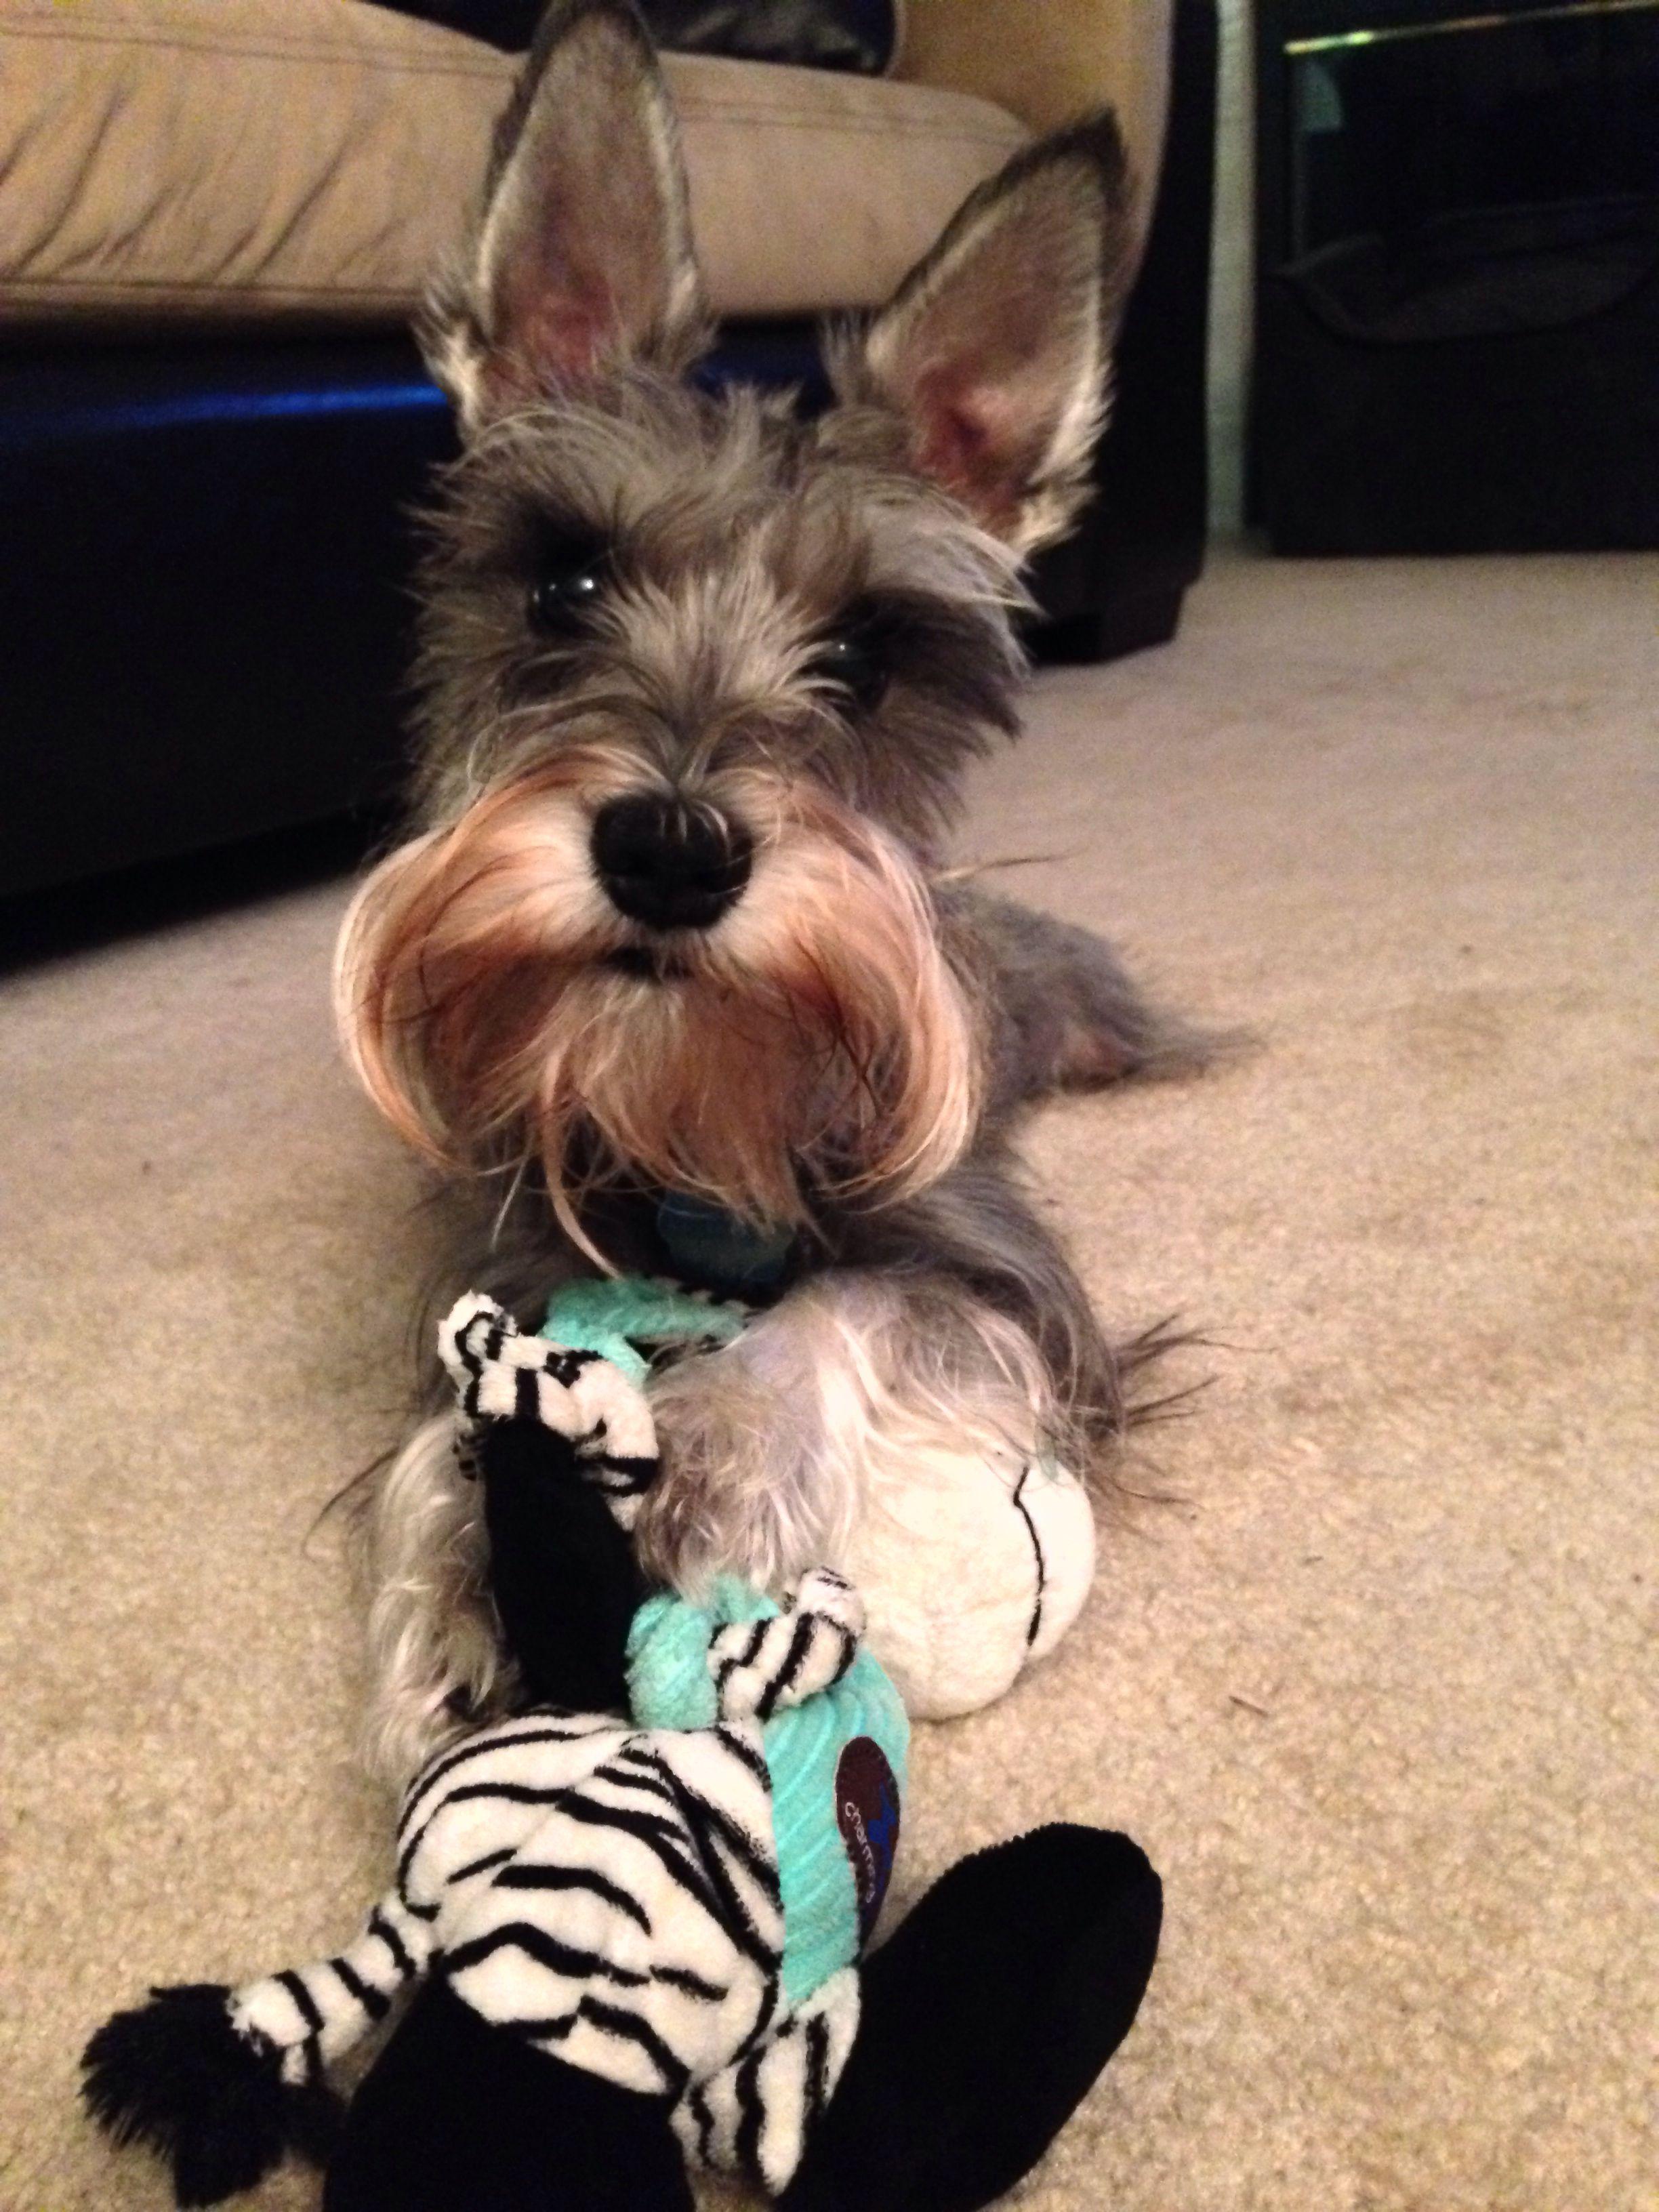 A Miniature Schnauzer His Chew Toy Mini Schnauzer Puppies Baby Dogs Love Pet